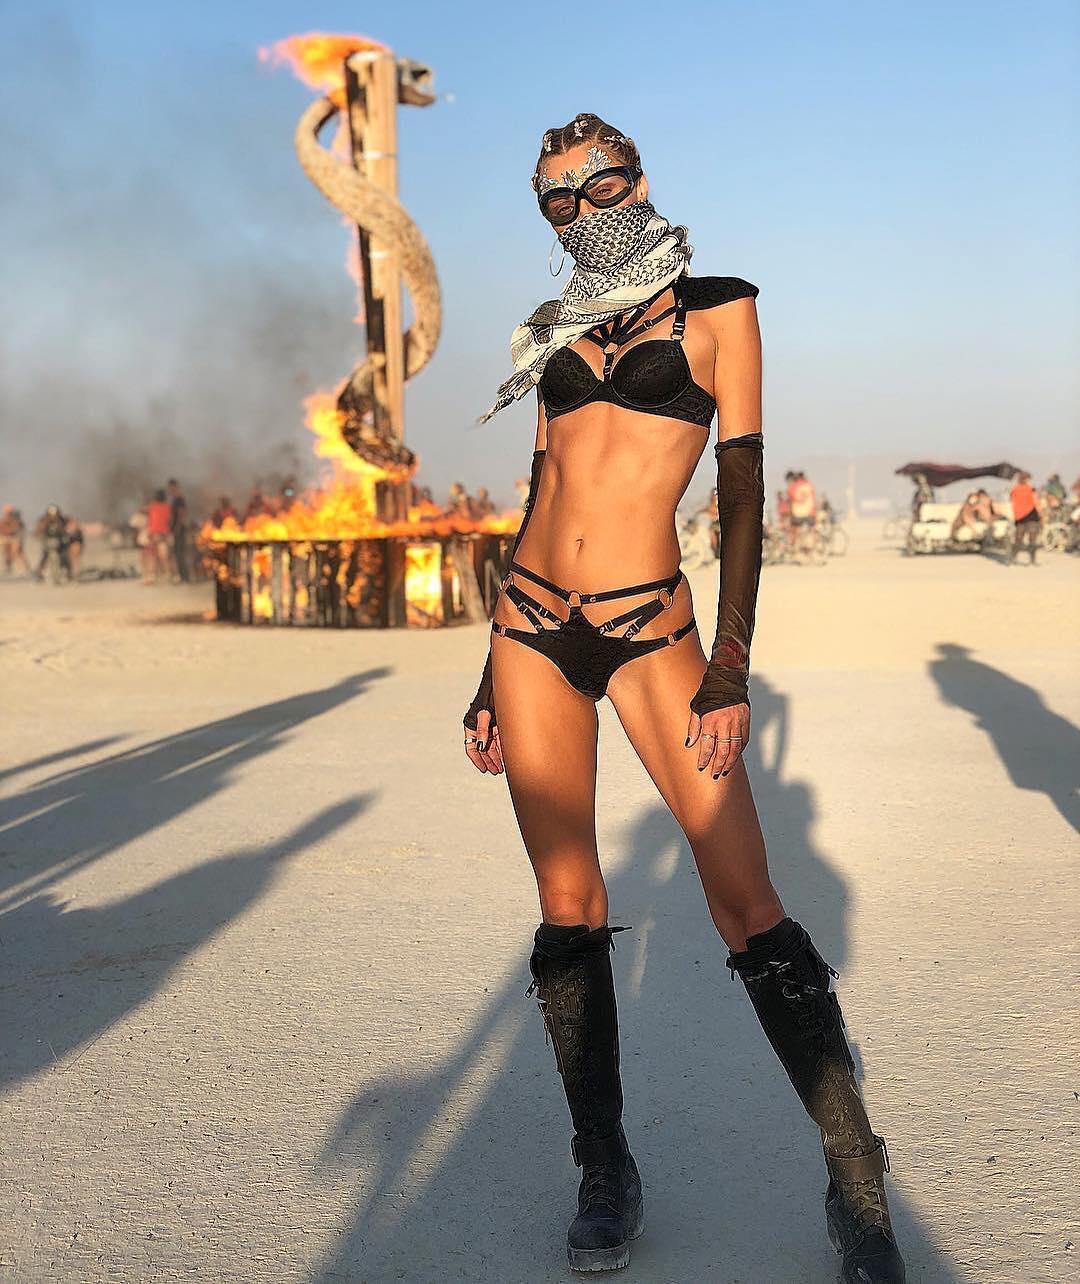 Chicks at burning man, sexy boobs veronica zemanova